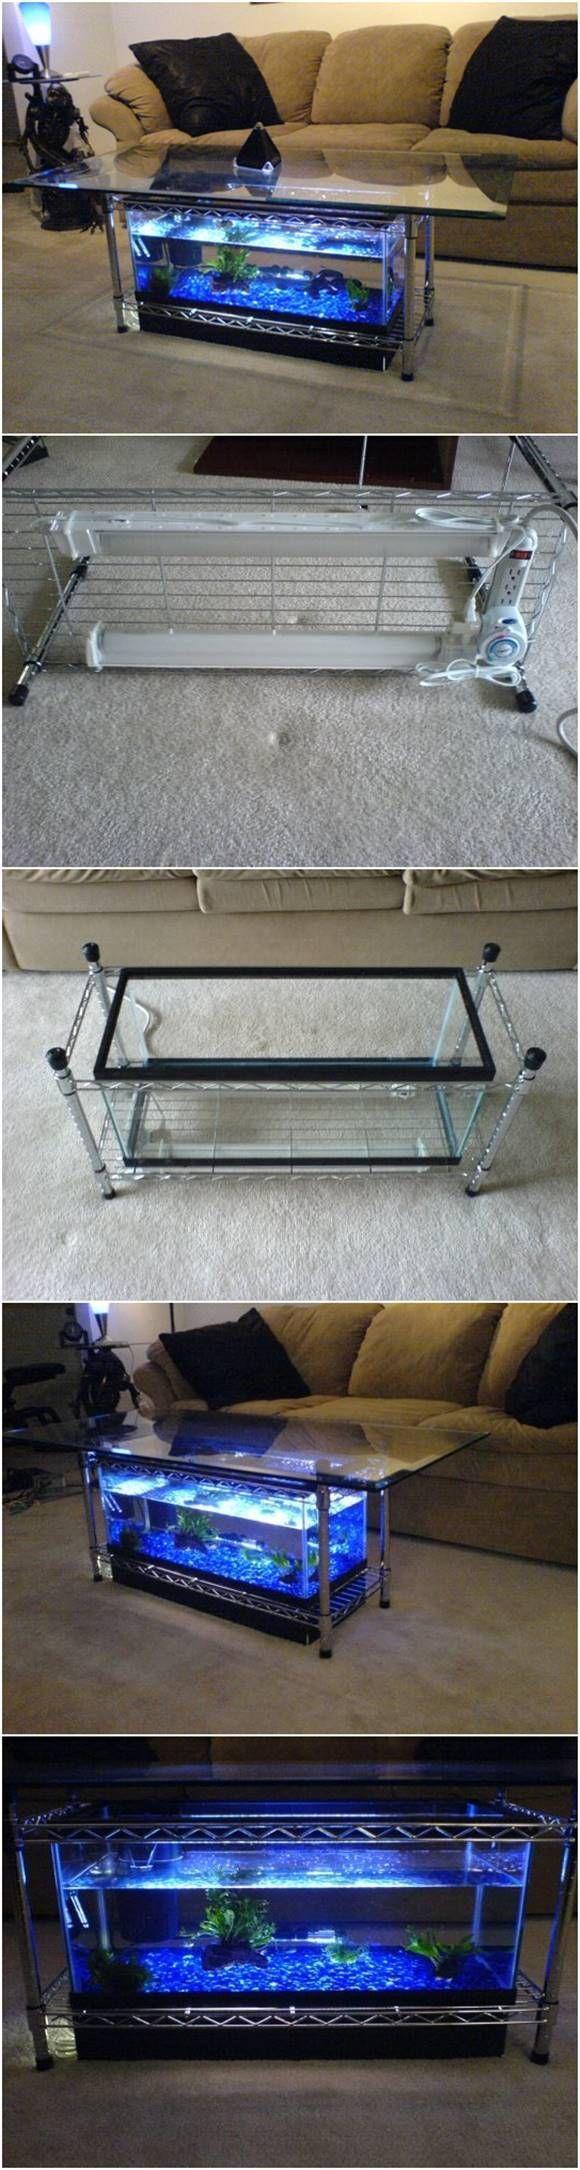 How to Make an Aquarium Coffee Table #furniture #AquariumDecorationsIdeas